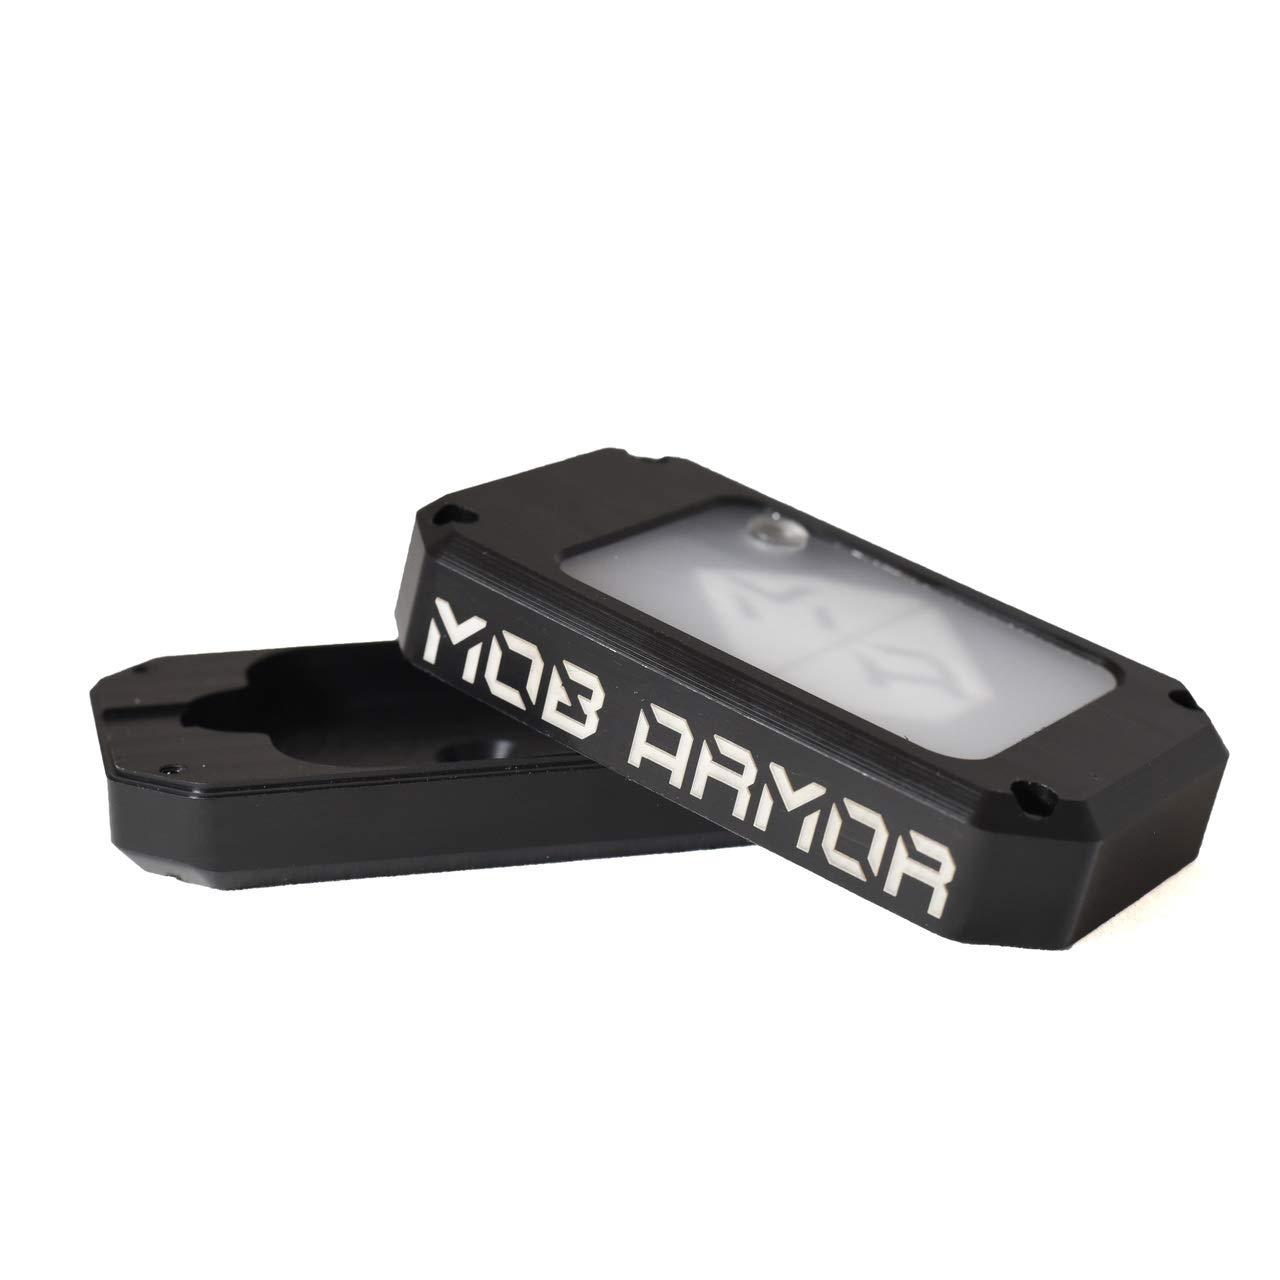 Mob Armor Dual SkyPro 160 GPS Case by MA Mob Armor